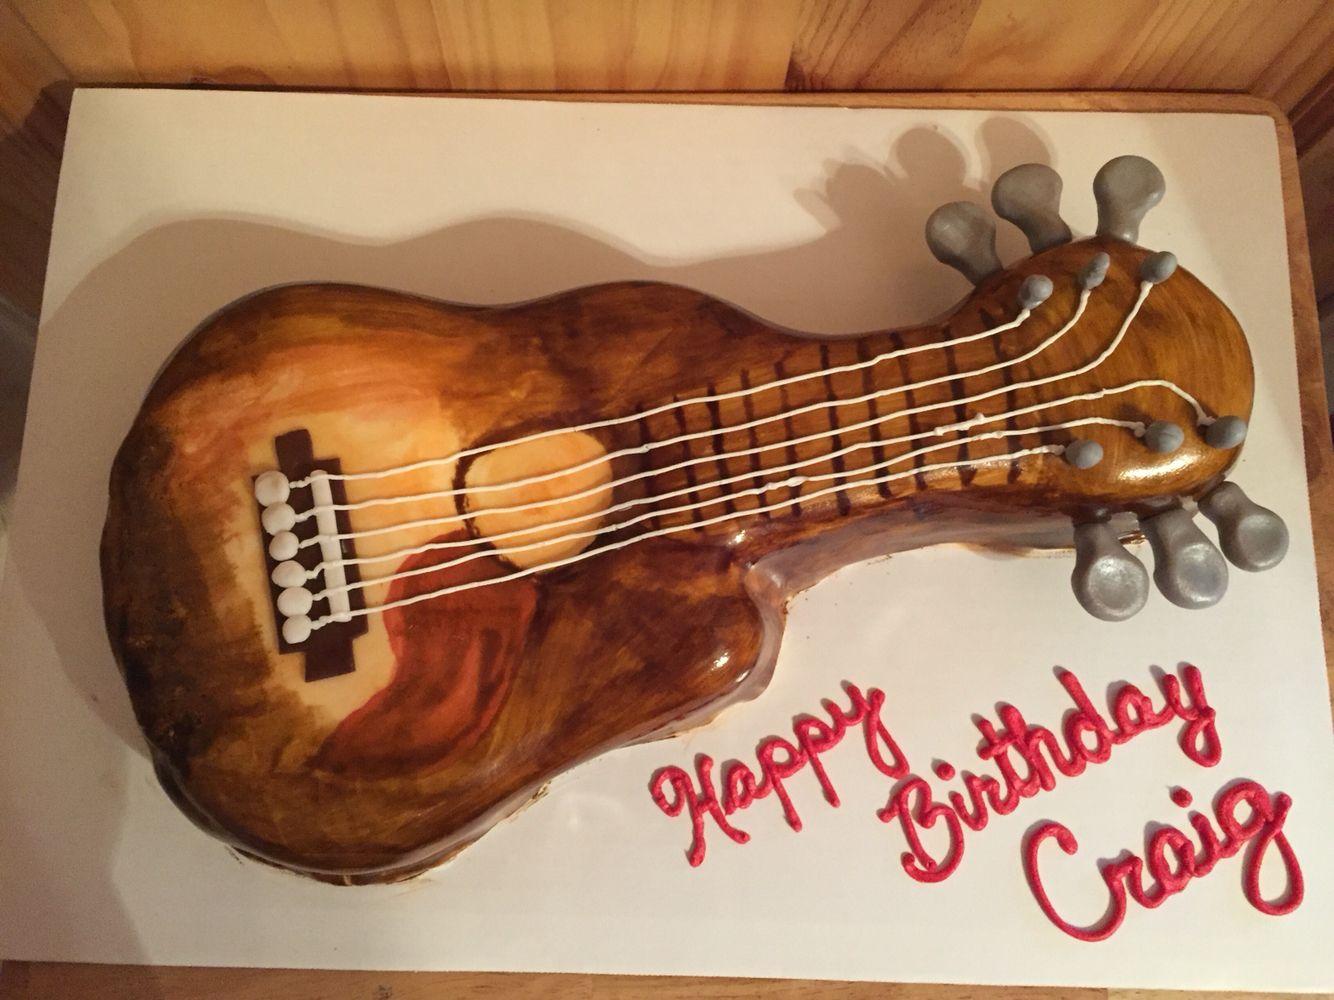 Craig's guitar